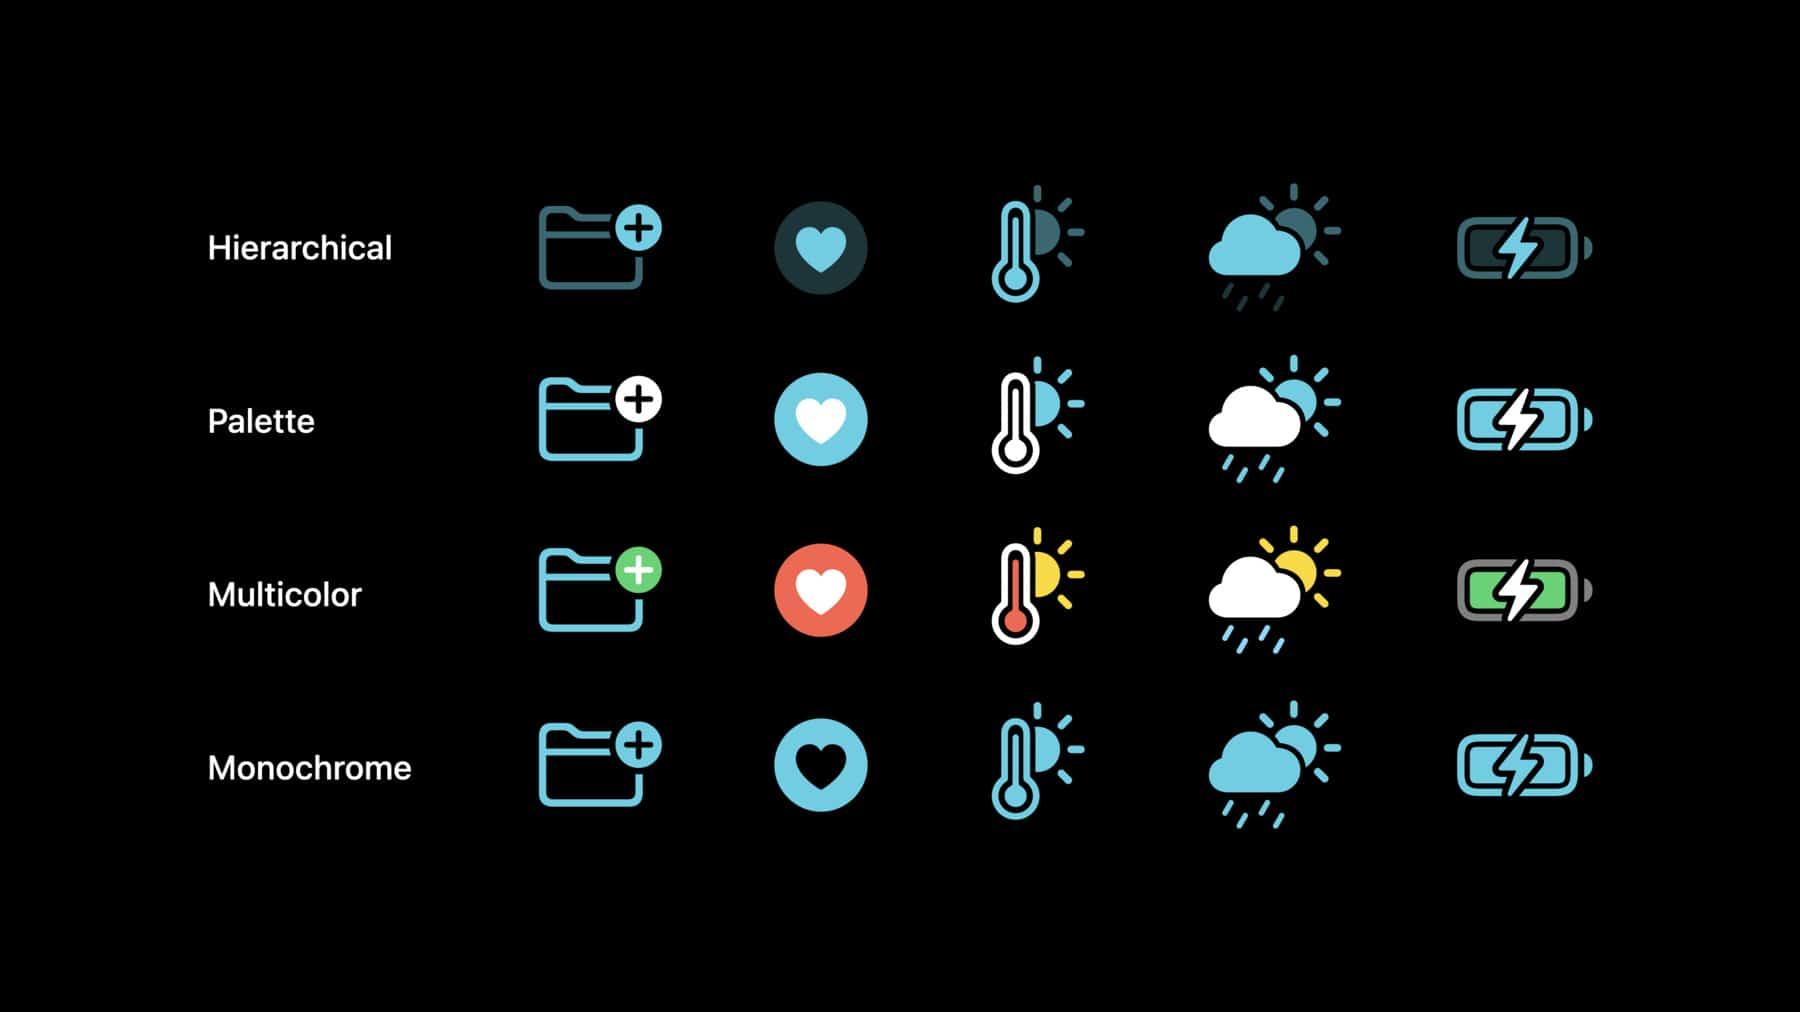 SF Symbols 3